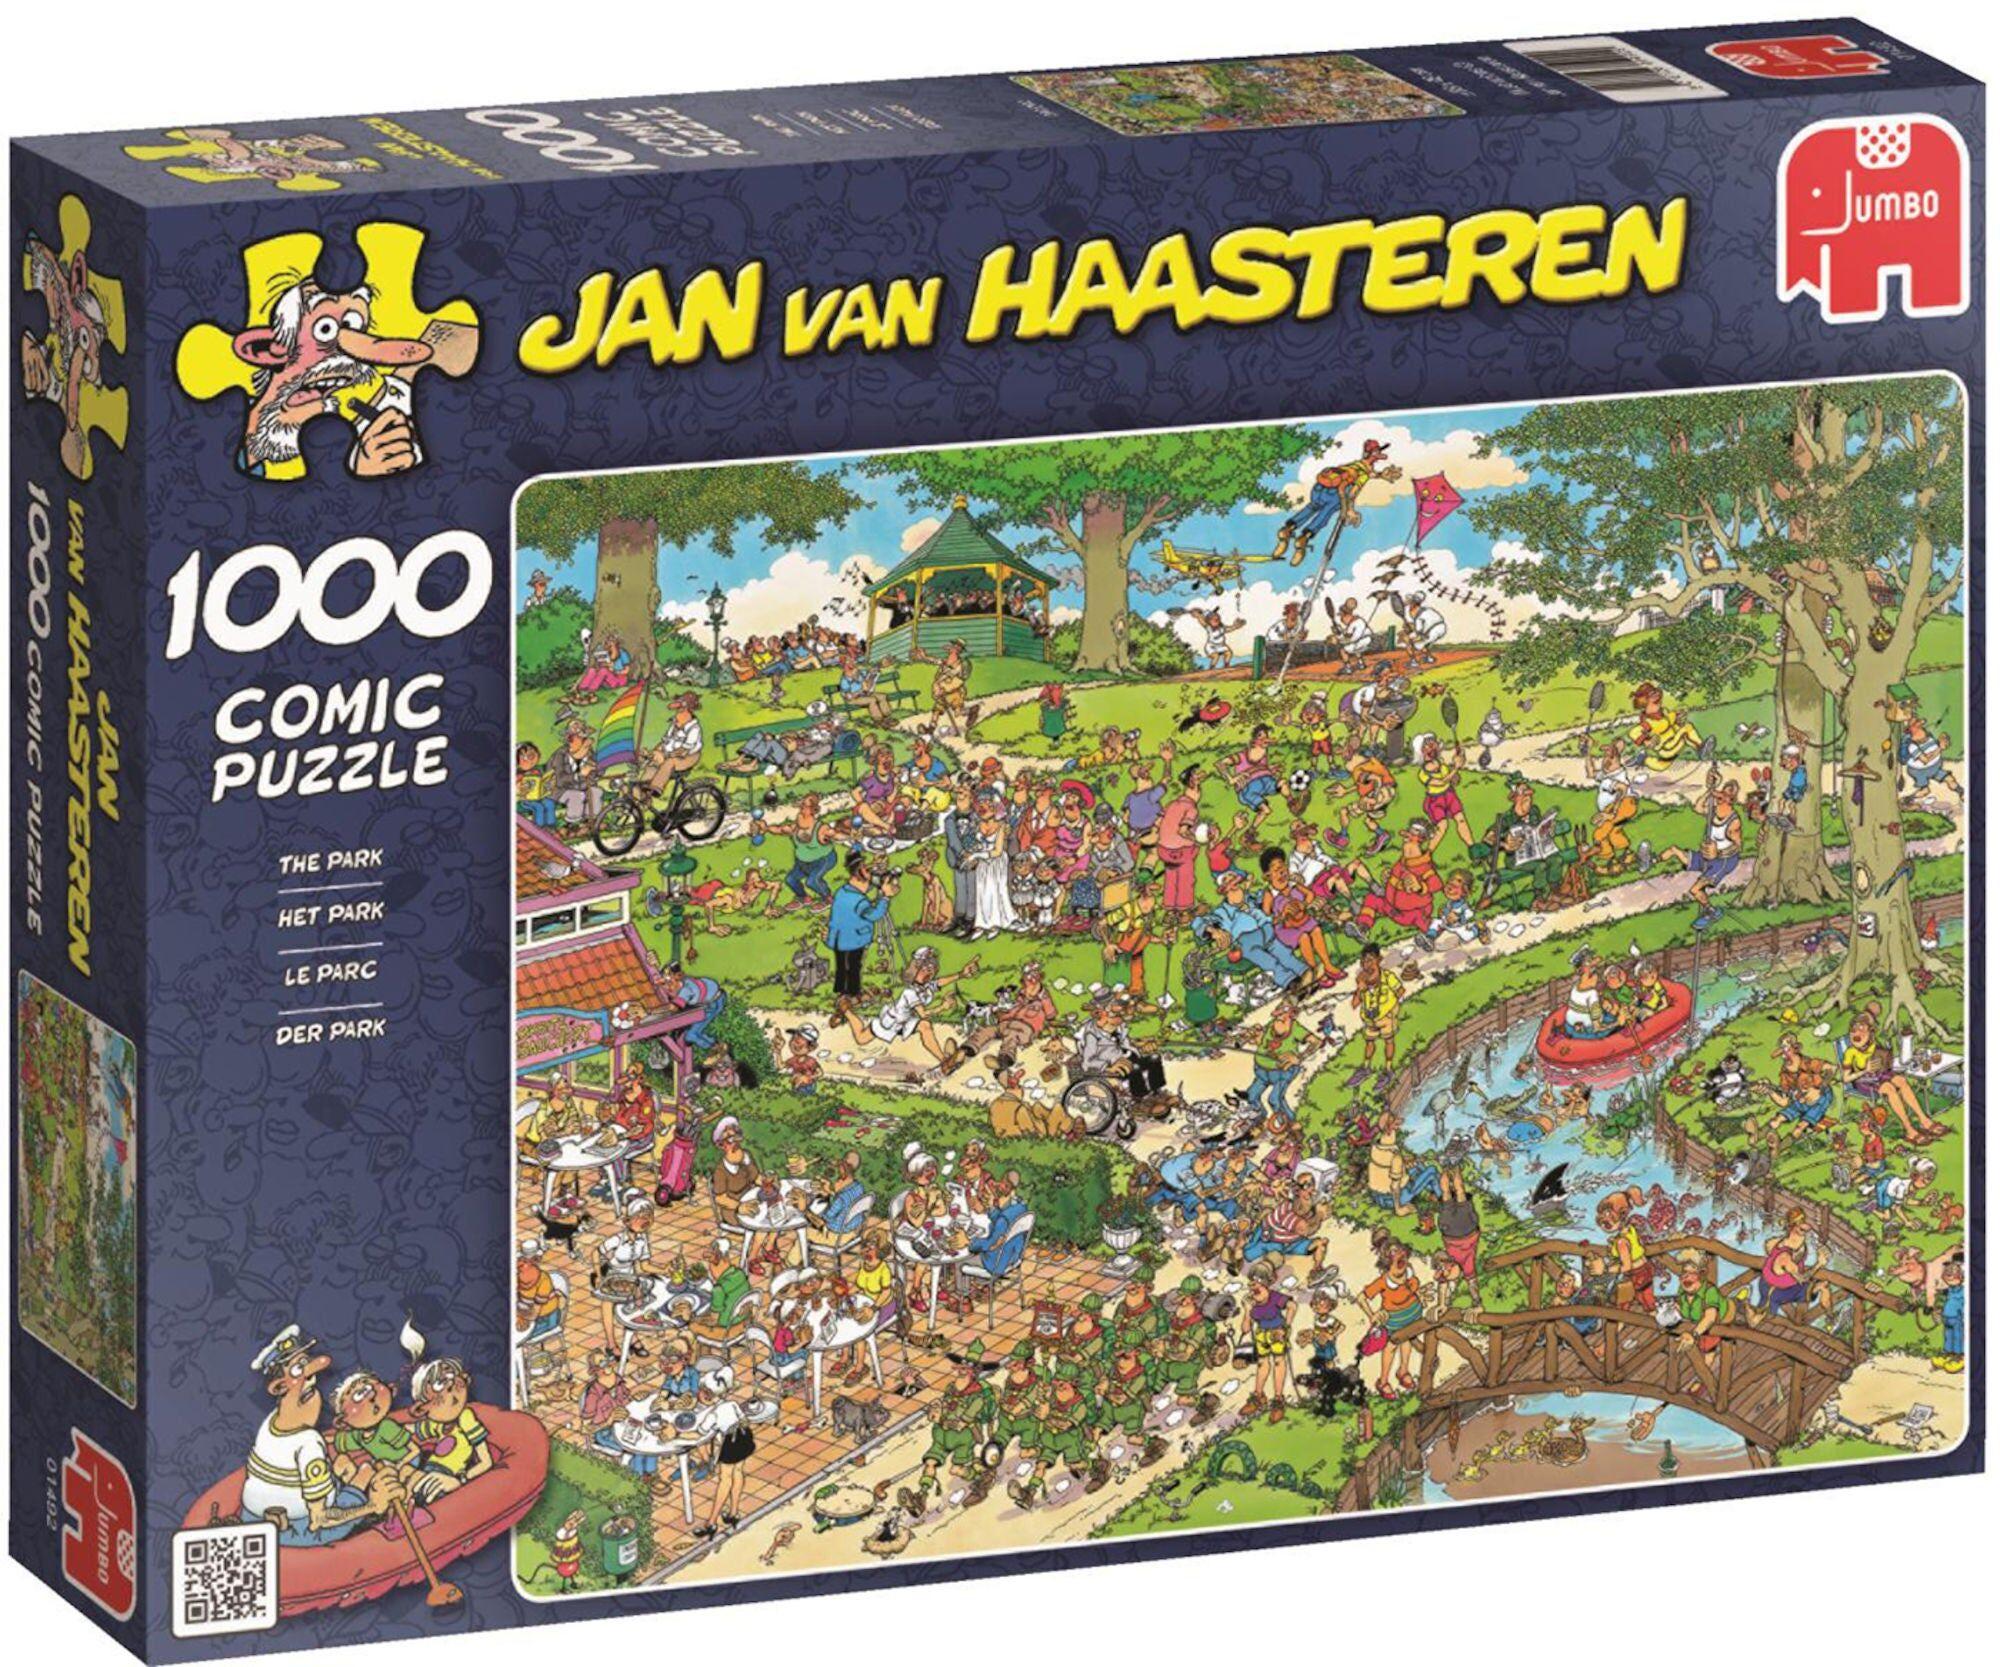 Jumbo Puslespill Jan van Haasteren The Park 1000